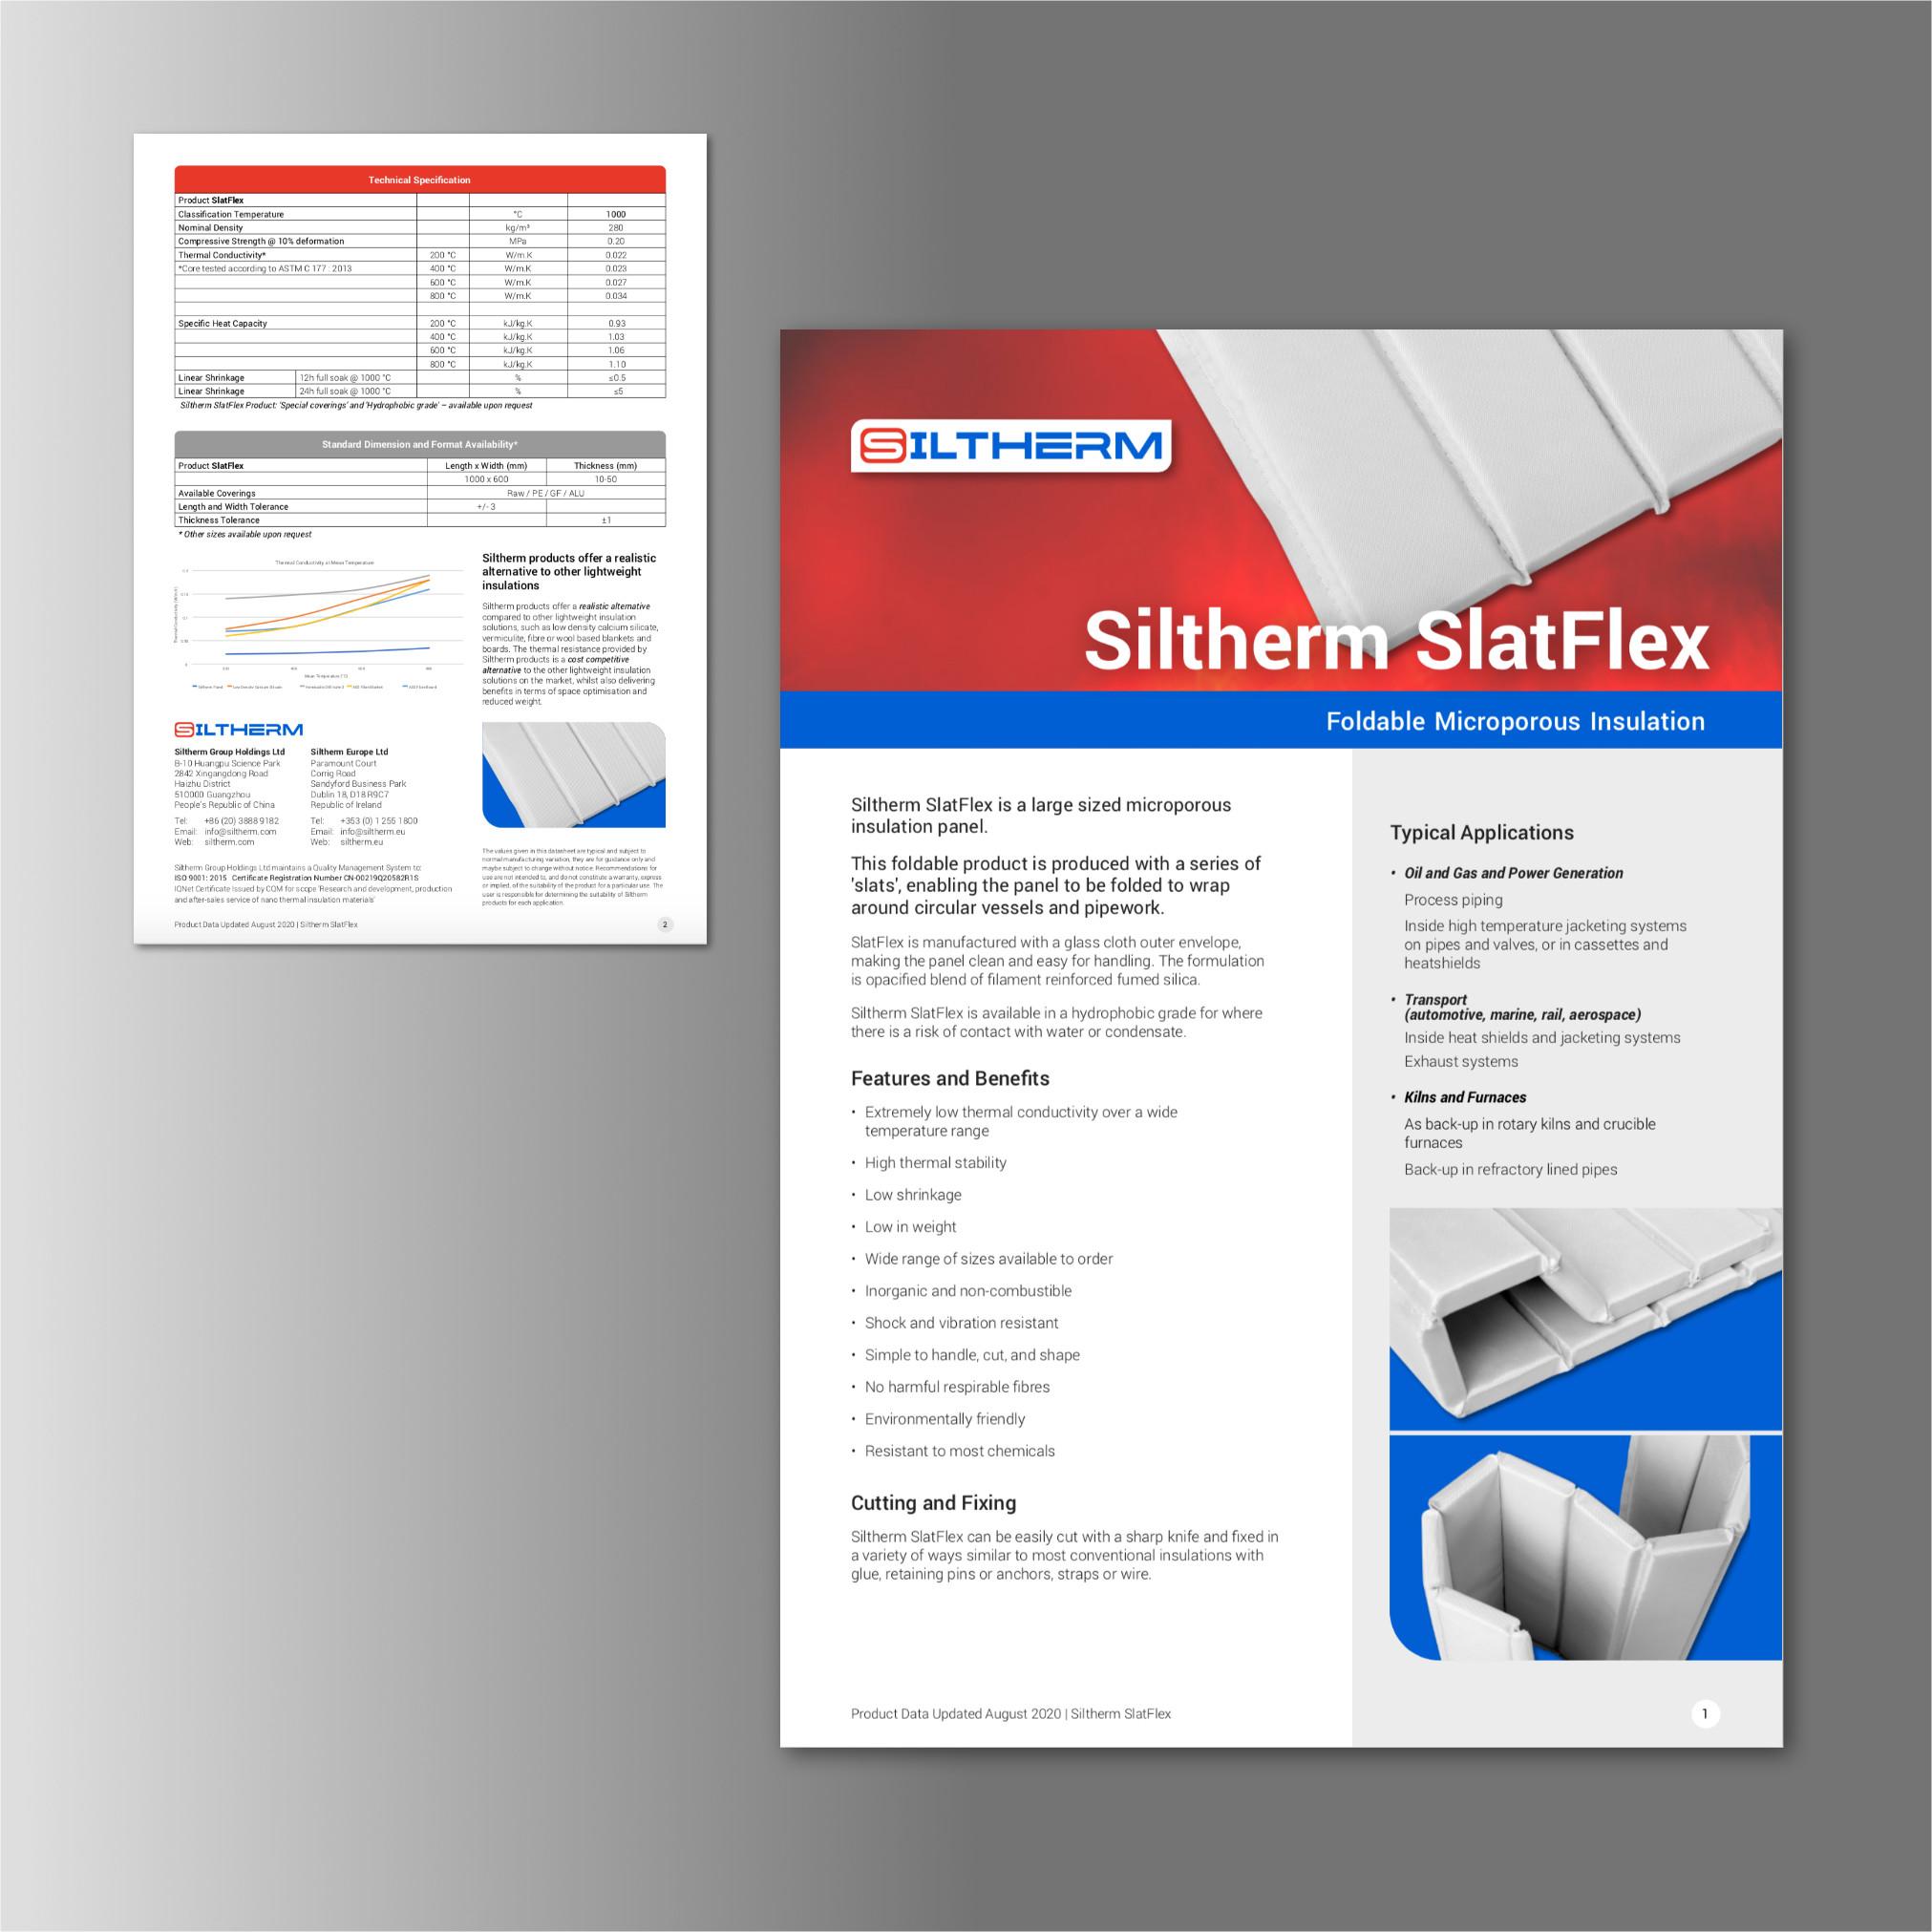 Siltherm SlatFlex Data Sheet, web PDF, Print Design by Orangebox Digital, 2020